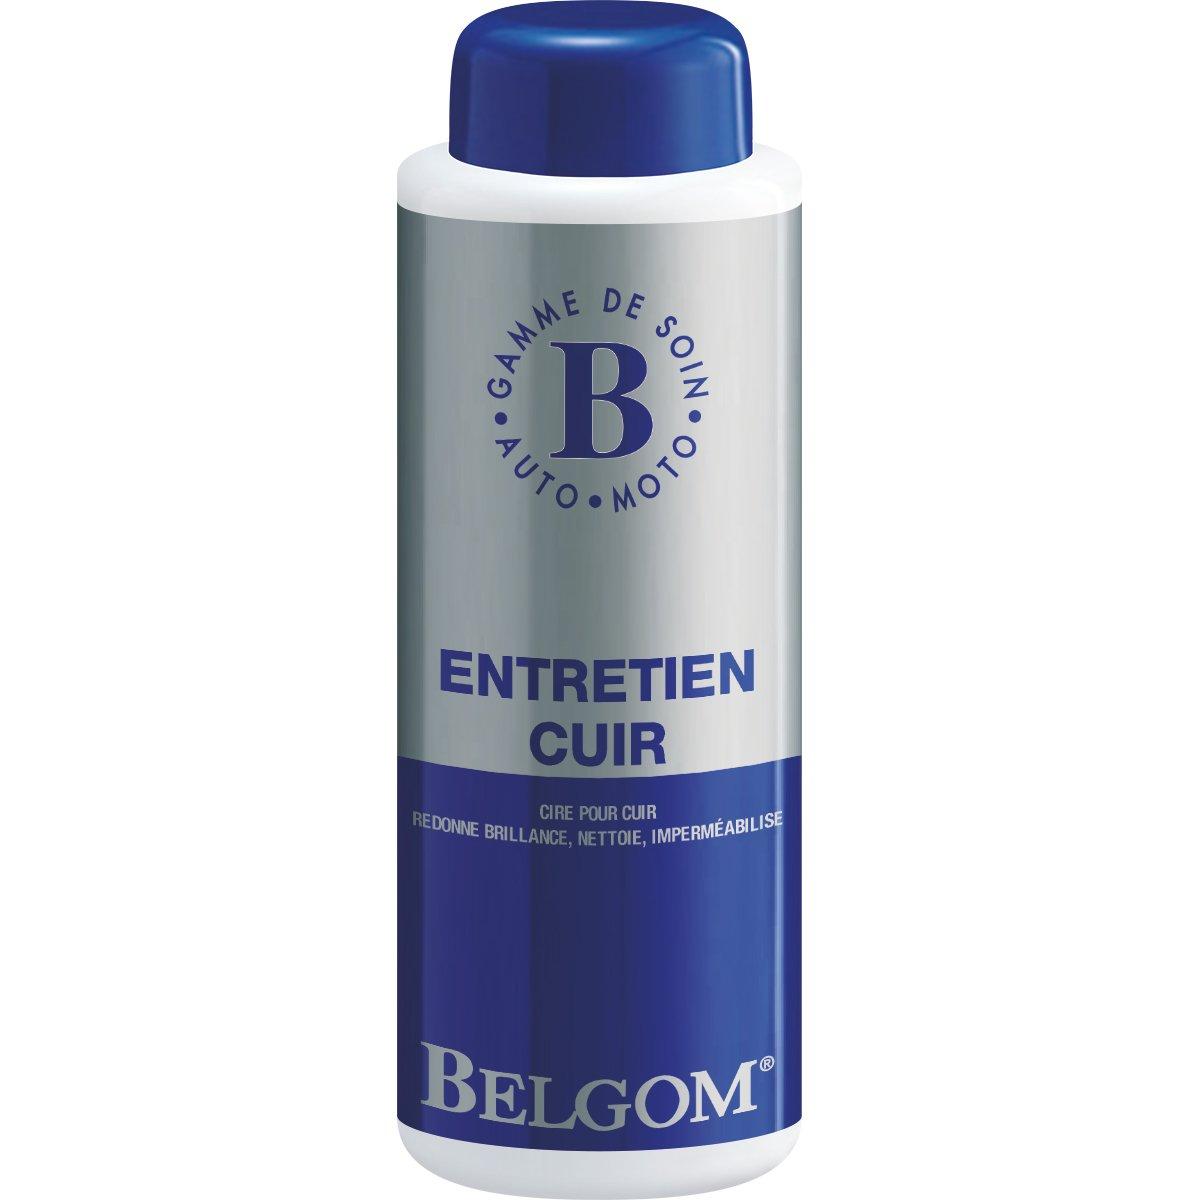 Belgom 11.0500 Entretien Cuir, 500 ML Soditen